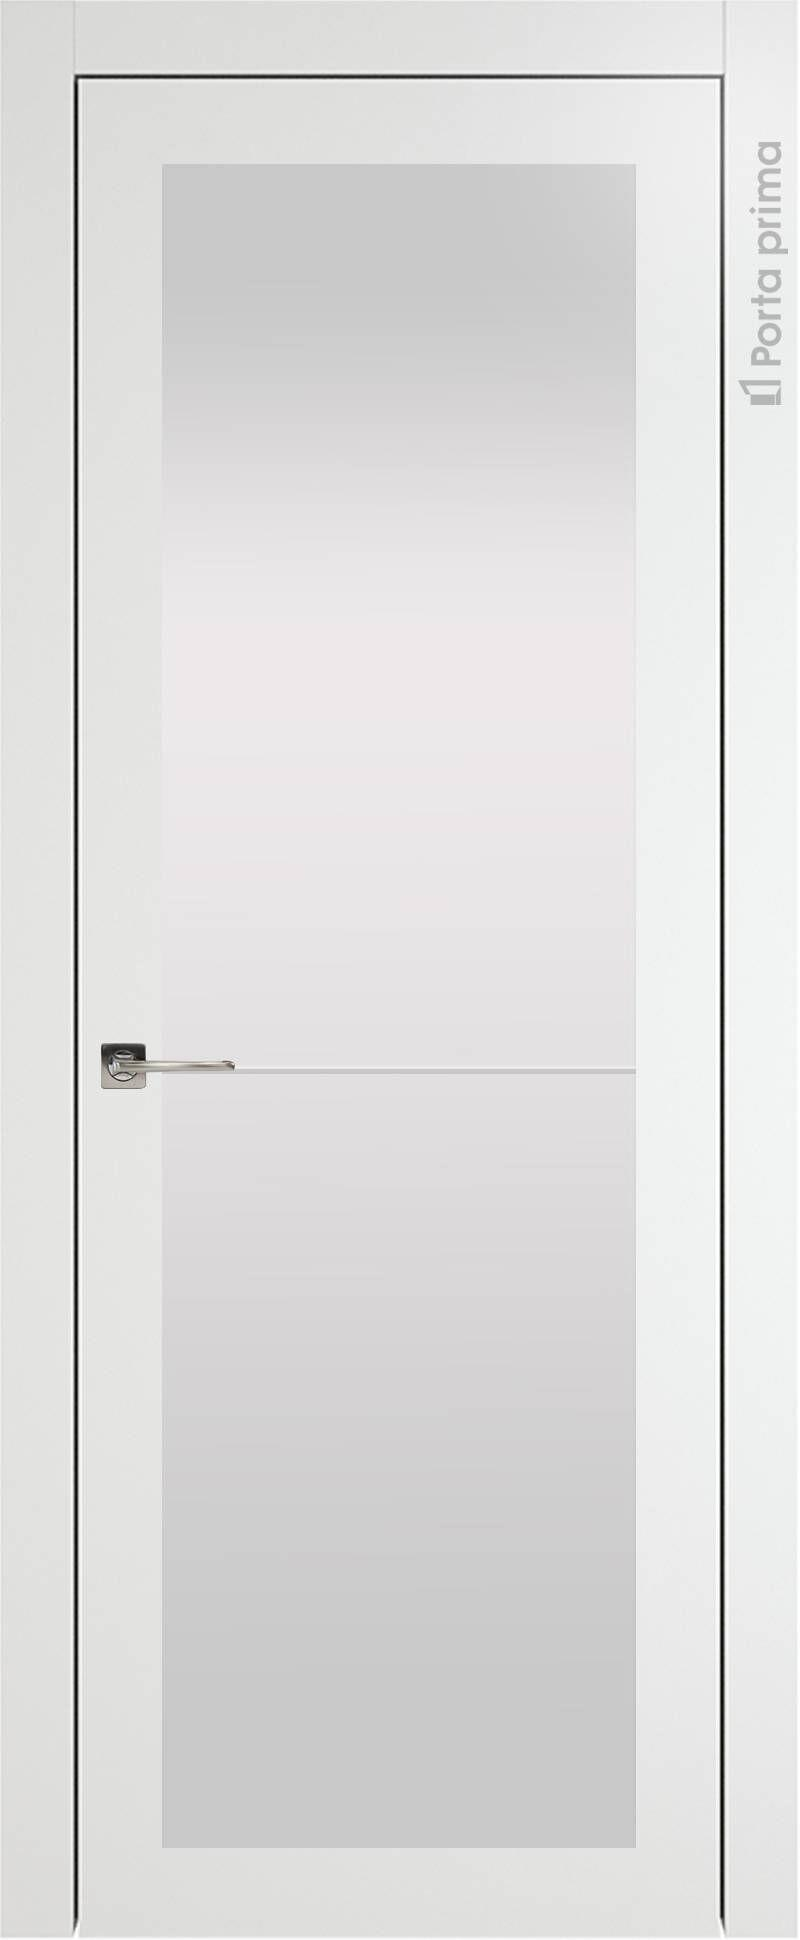 Tivoli З-2 цвет - Белая эмаль (RAL 9003) Со стеклом (ДО)